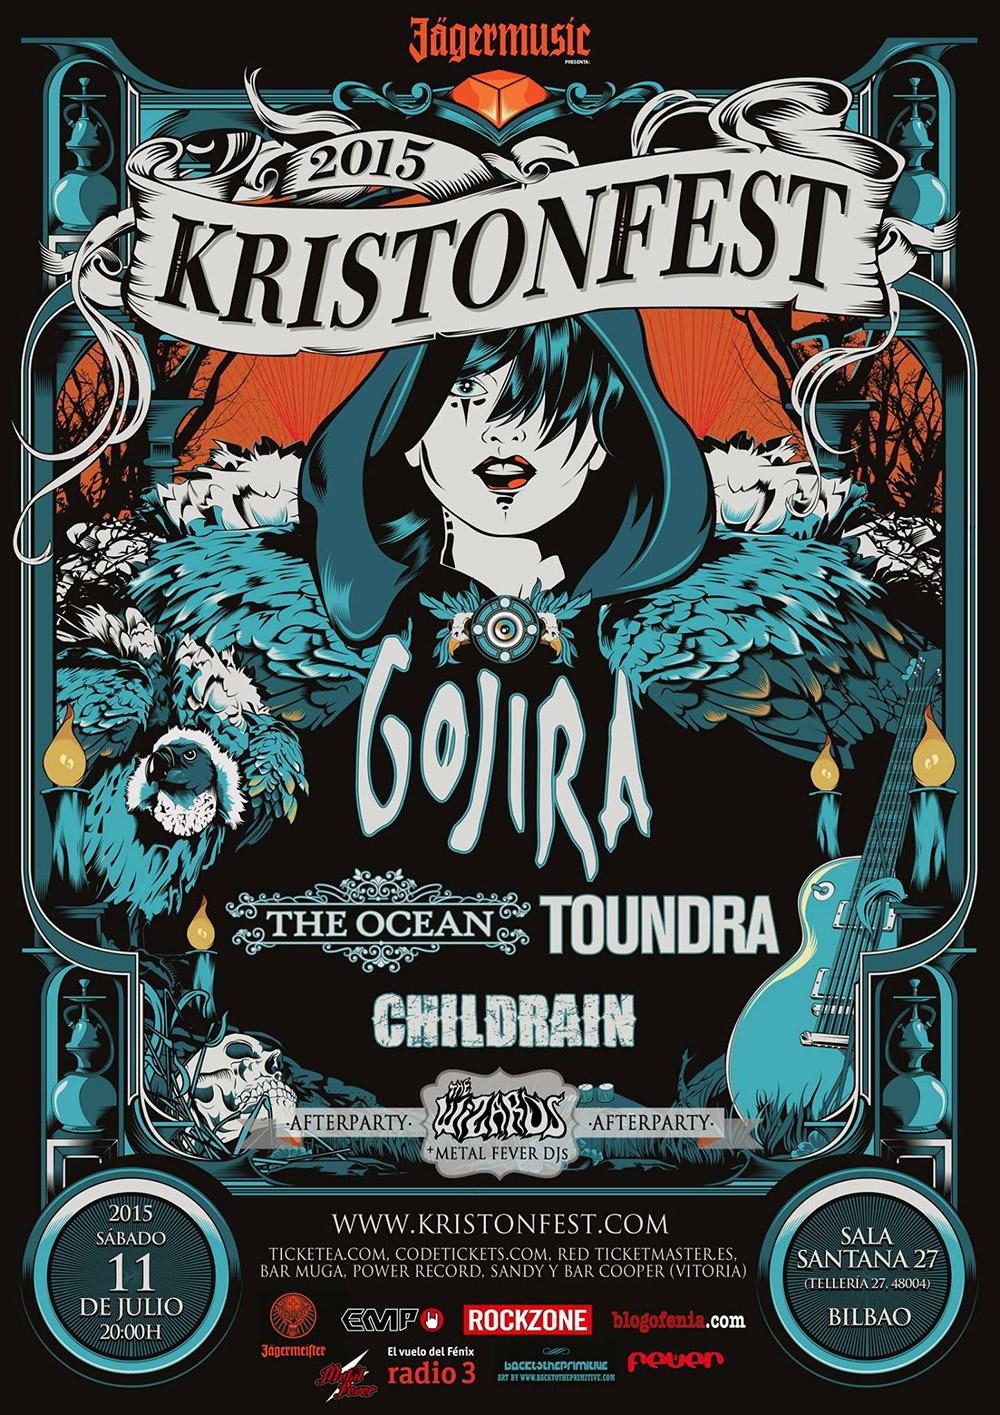 Se acerca el Kristonfest 2015: Cartel, horarios, entradas, etc...